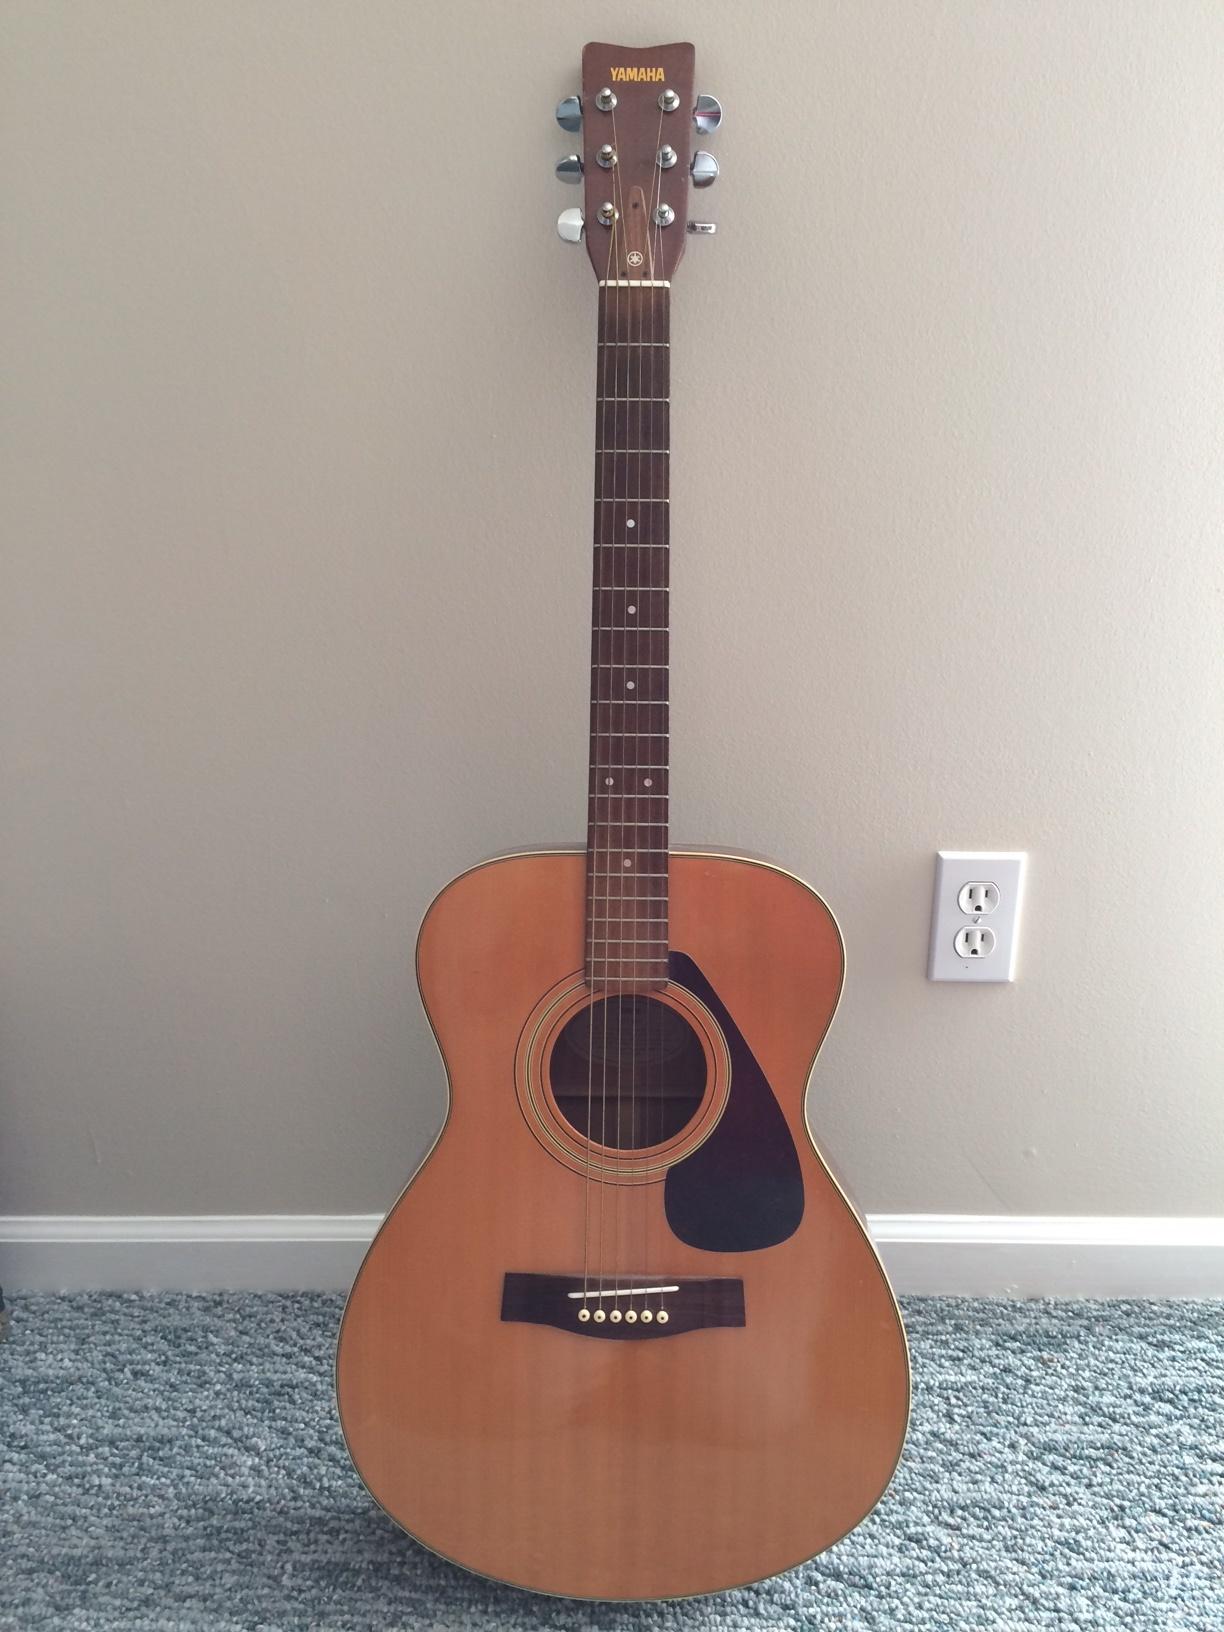 File:Yamaha Acoustic Guitar FG-331 JPG - Wikimedia Commons